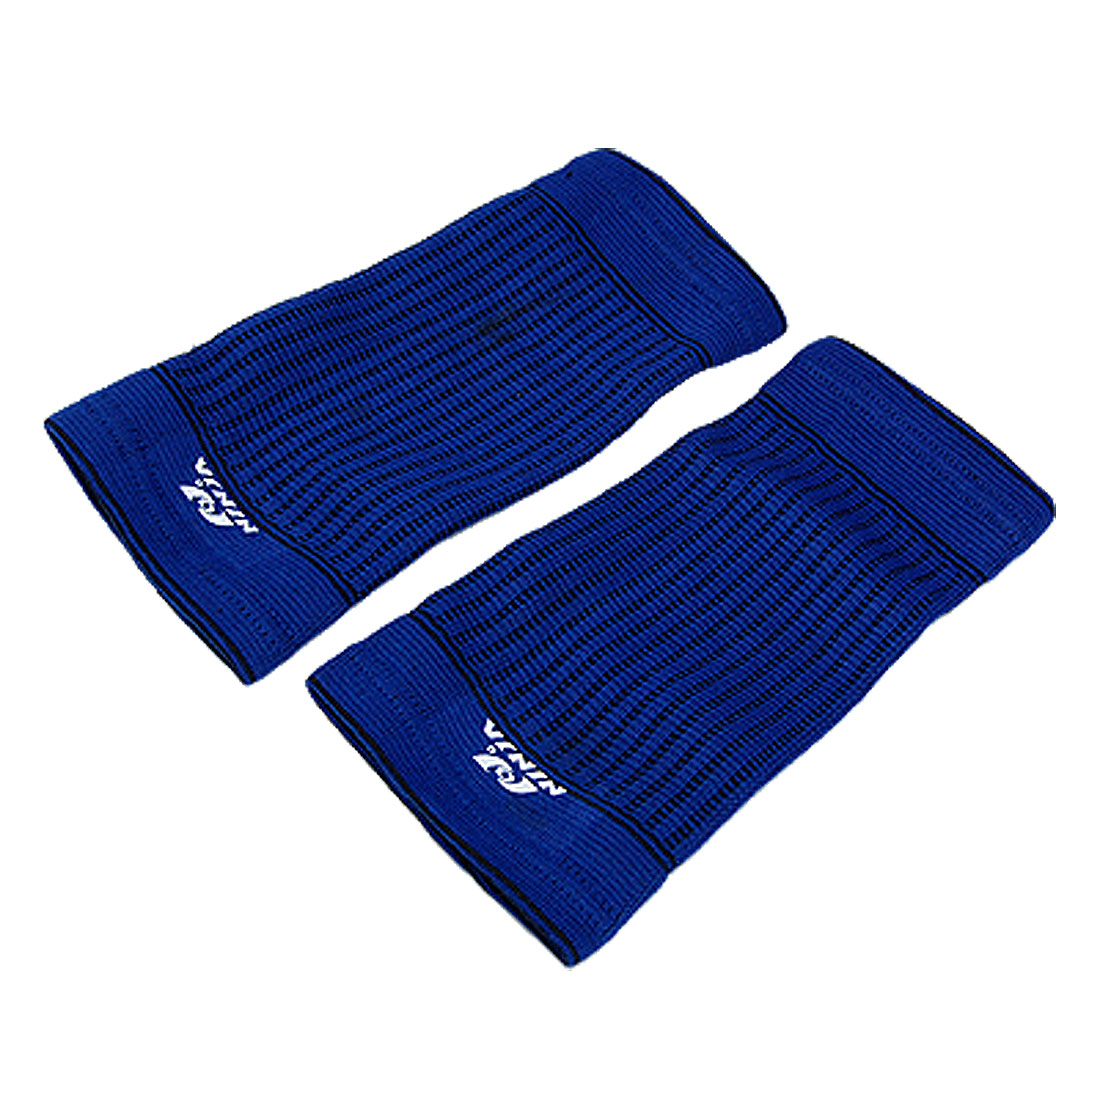 Elastic Blue Sport Crus Brace Support Protector 2PCS